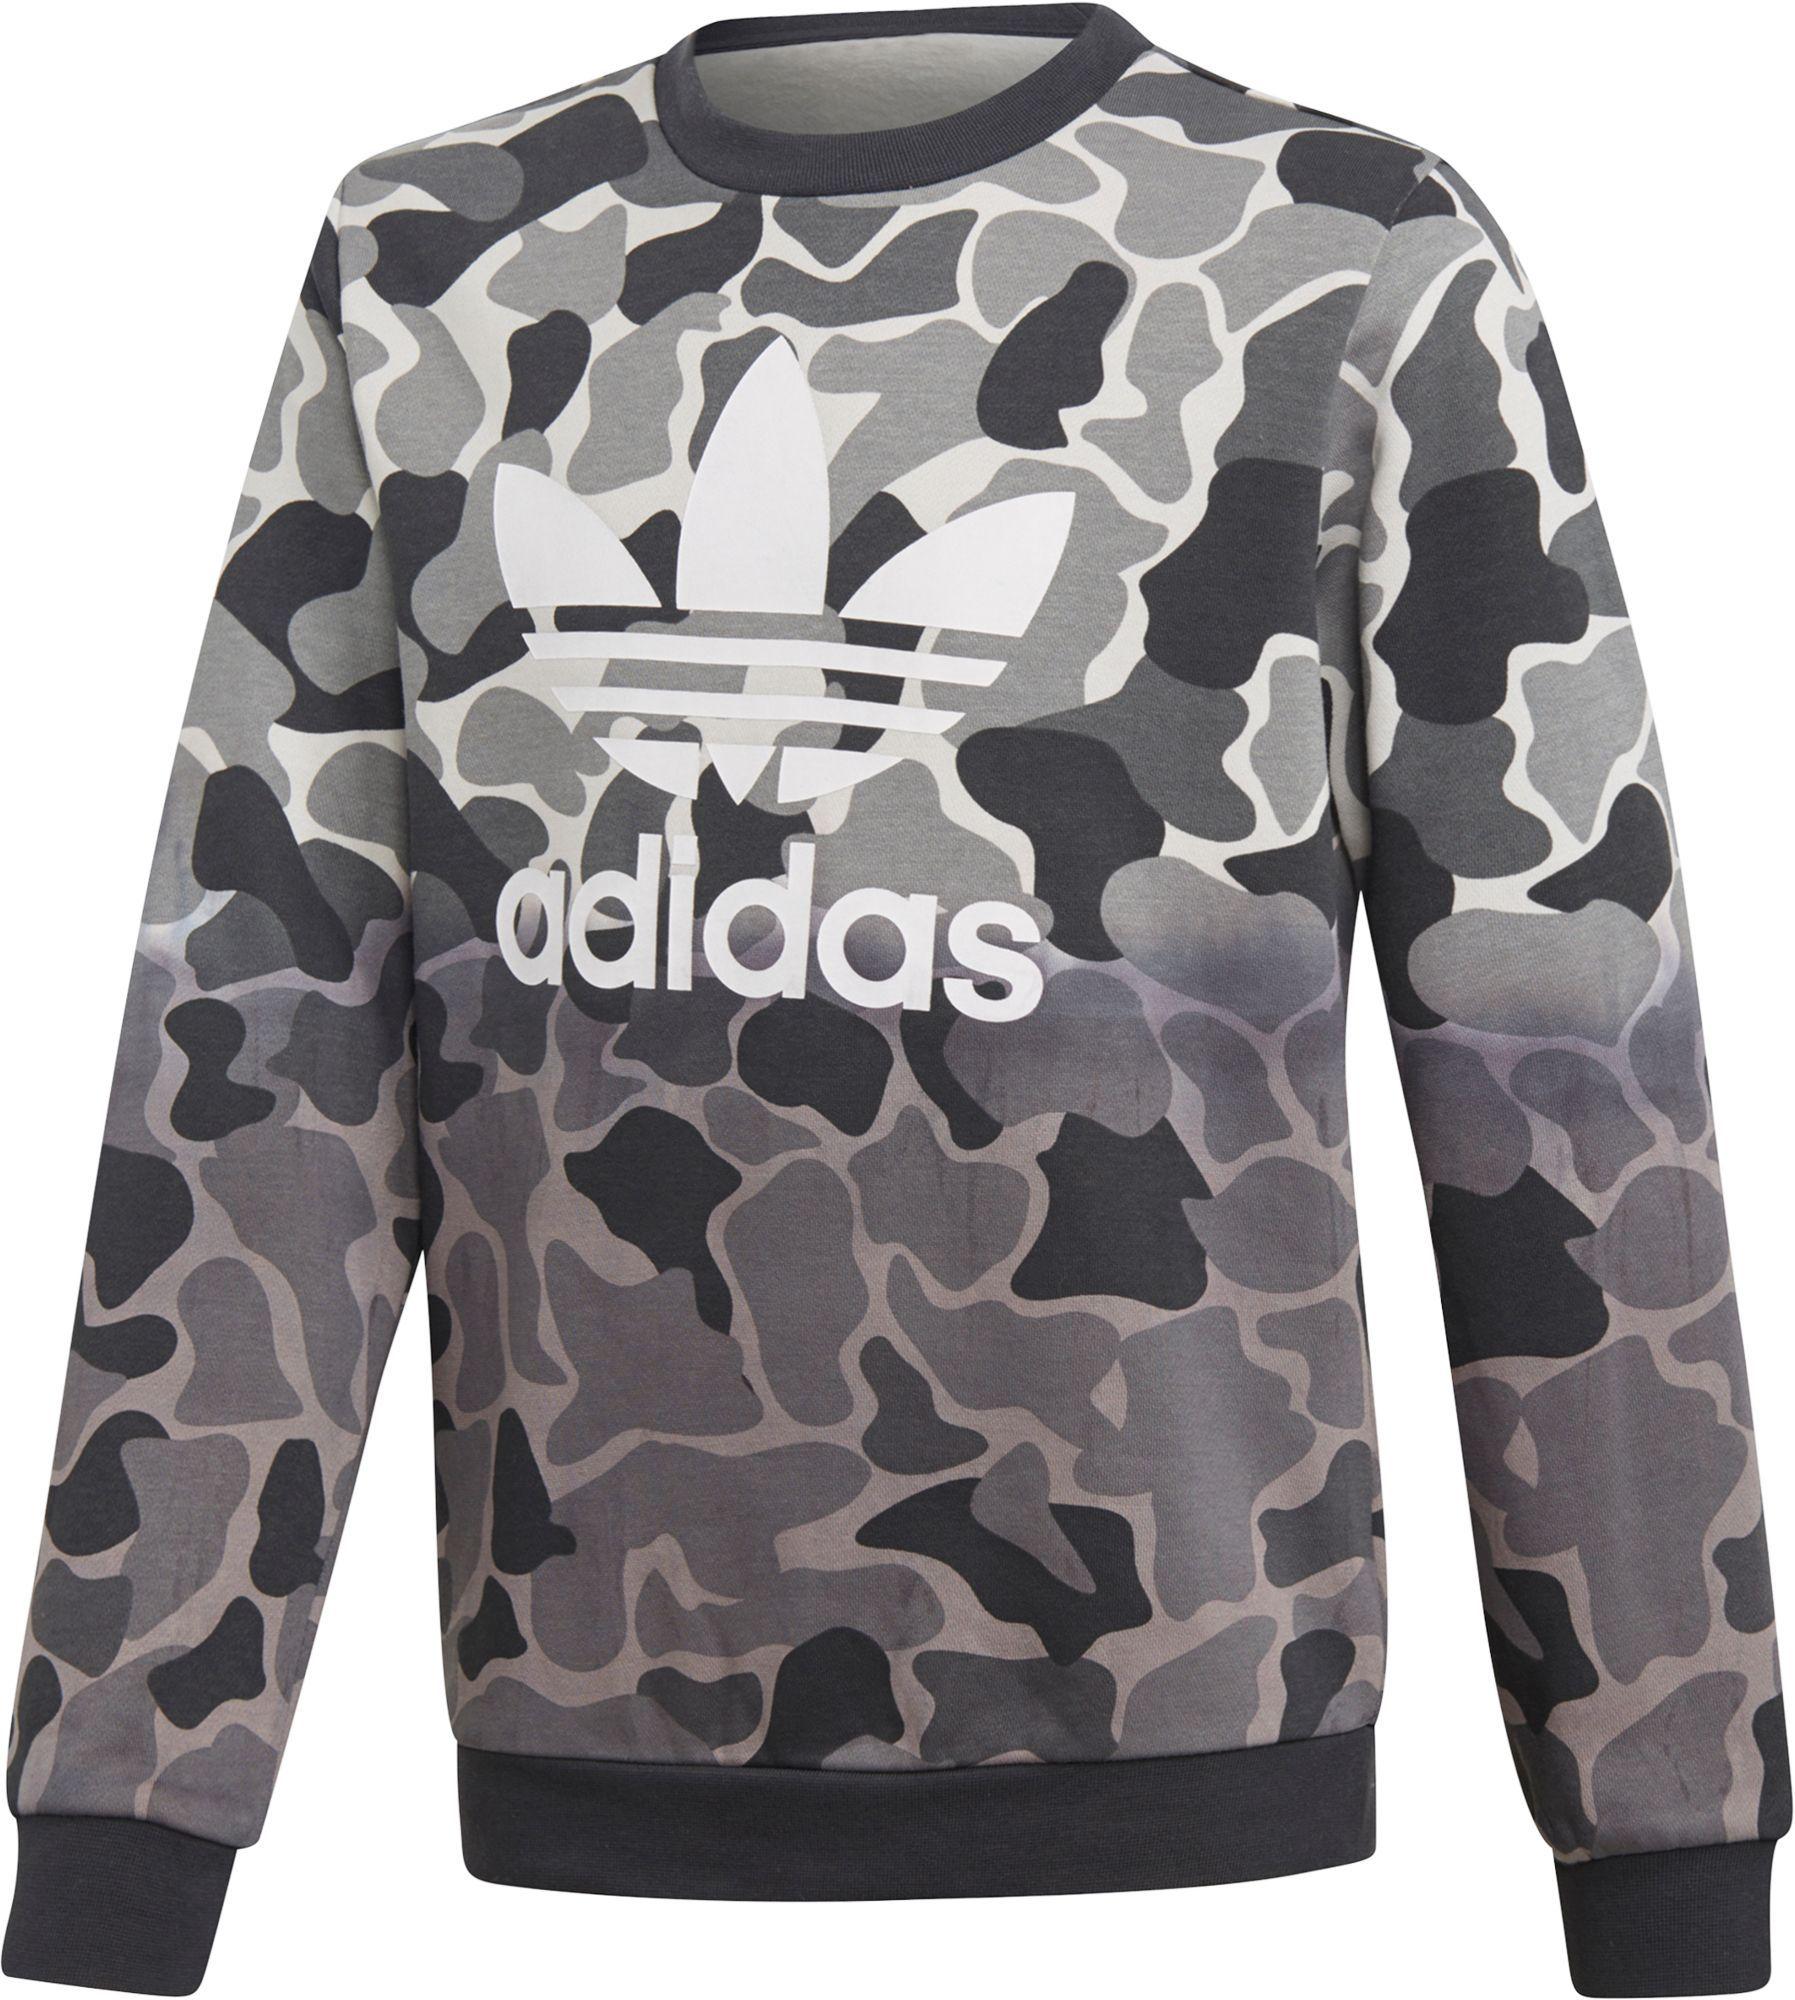 best sneakers 10e33 af75d adidas Originals Boys Camo Trefoil Crew Sweatshirt, GreenBlack